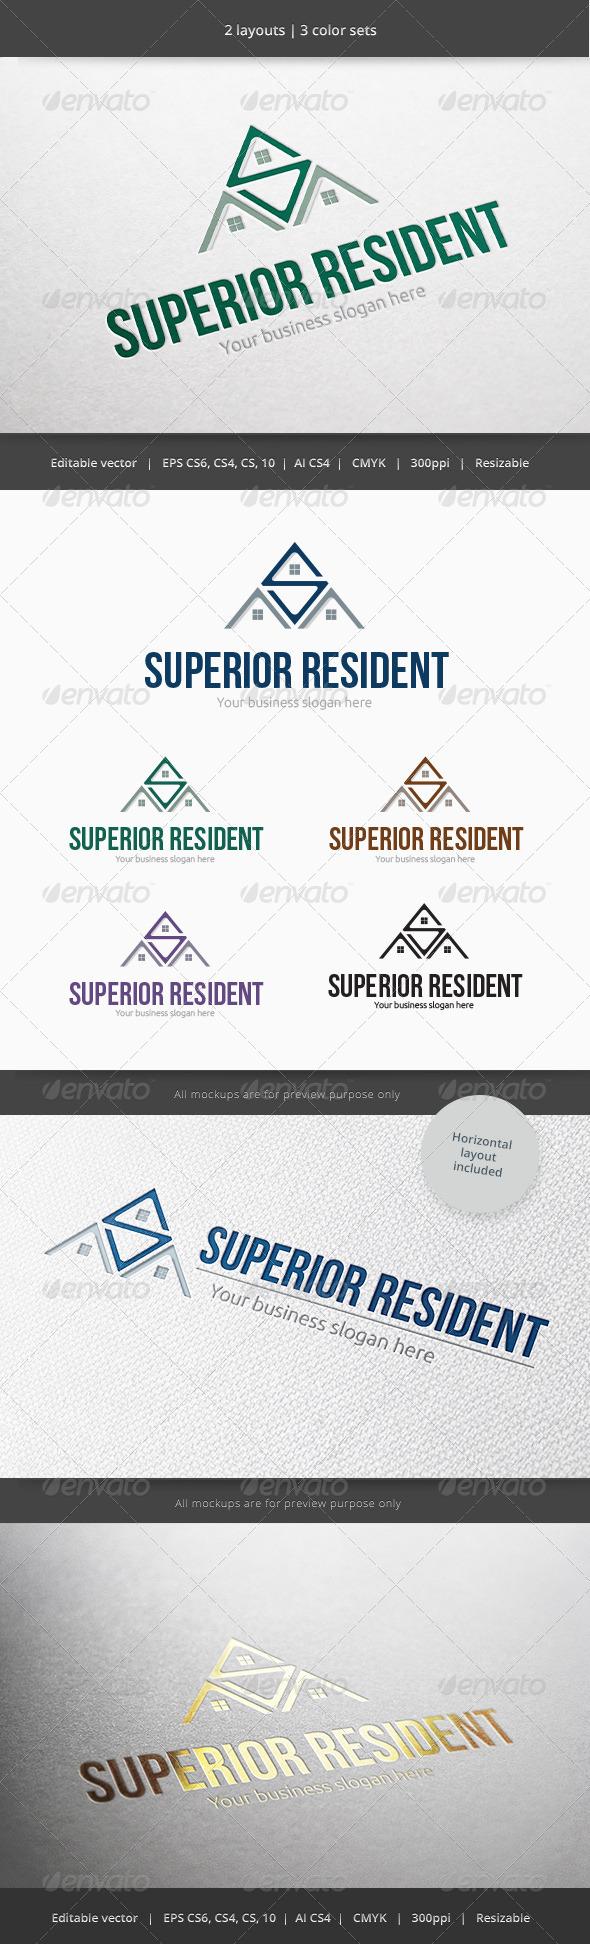 Superior Resident Home Logo - Buildings Logo Templates